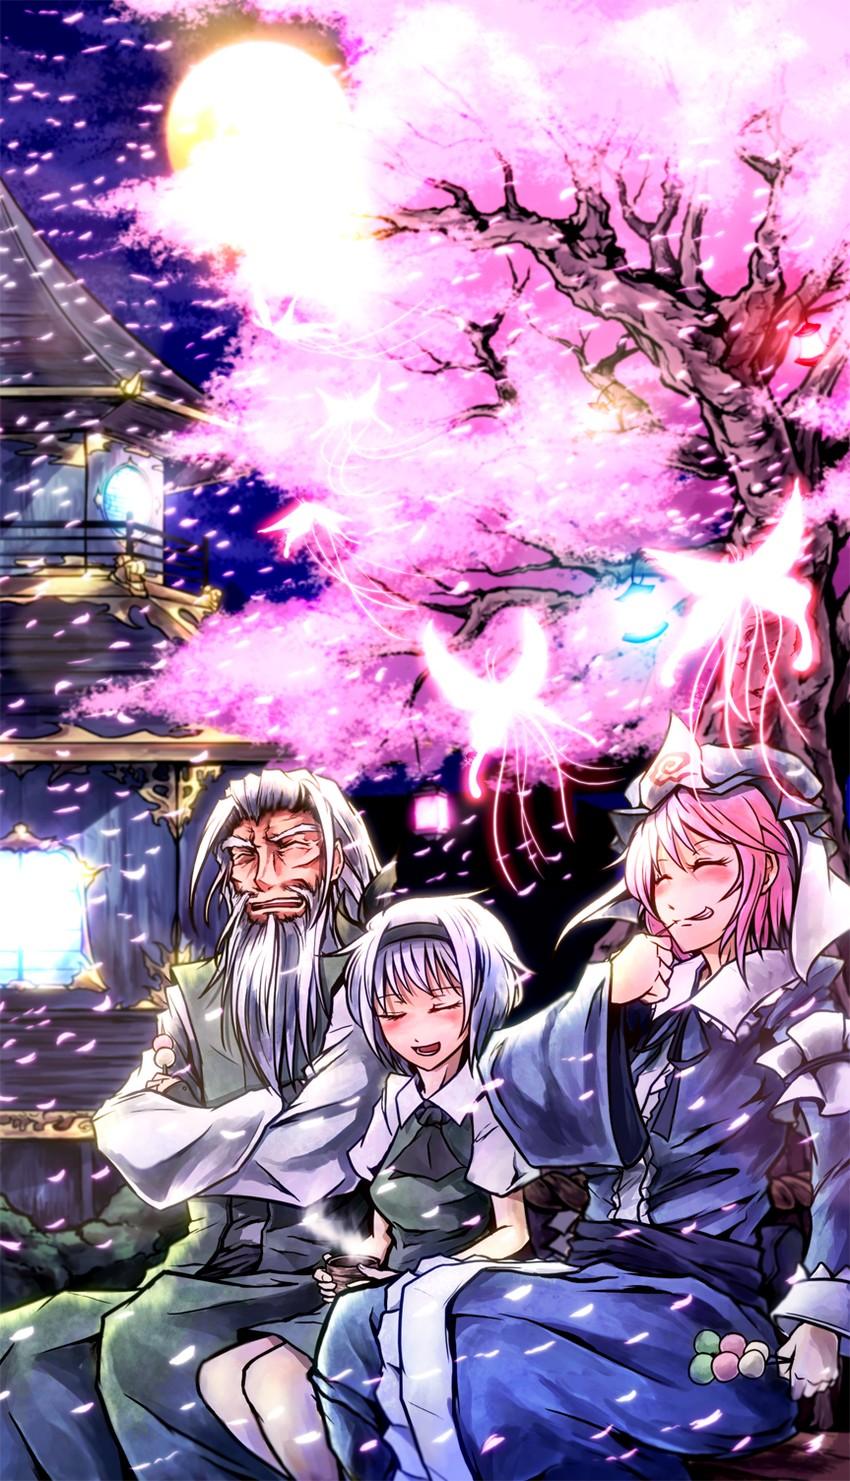 konpaku youki, konpaku youmu, and saigyouji yuyuko (touhou) drawn by ryuuichi (f dragon)